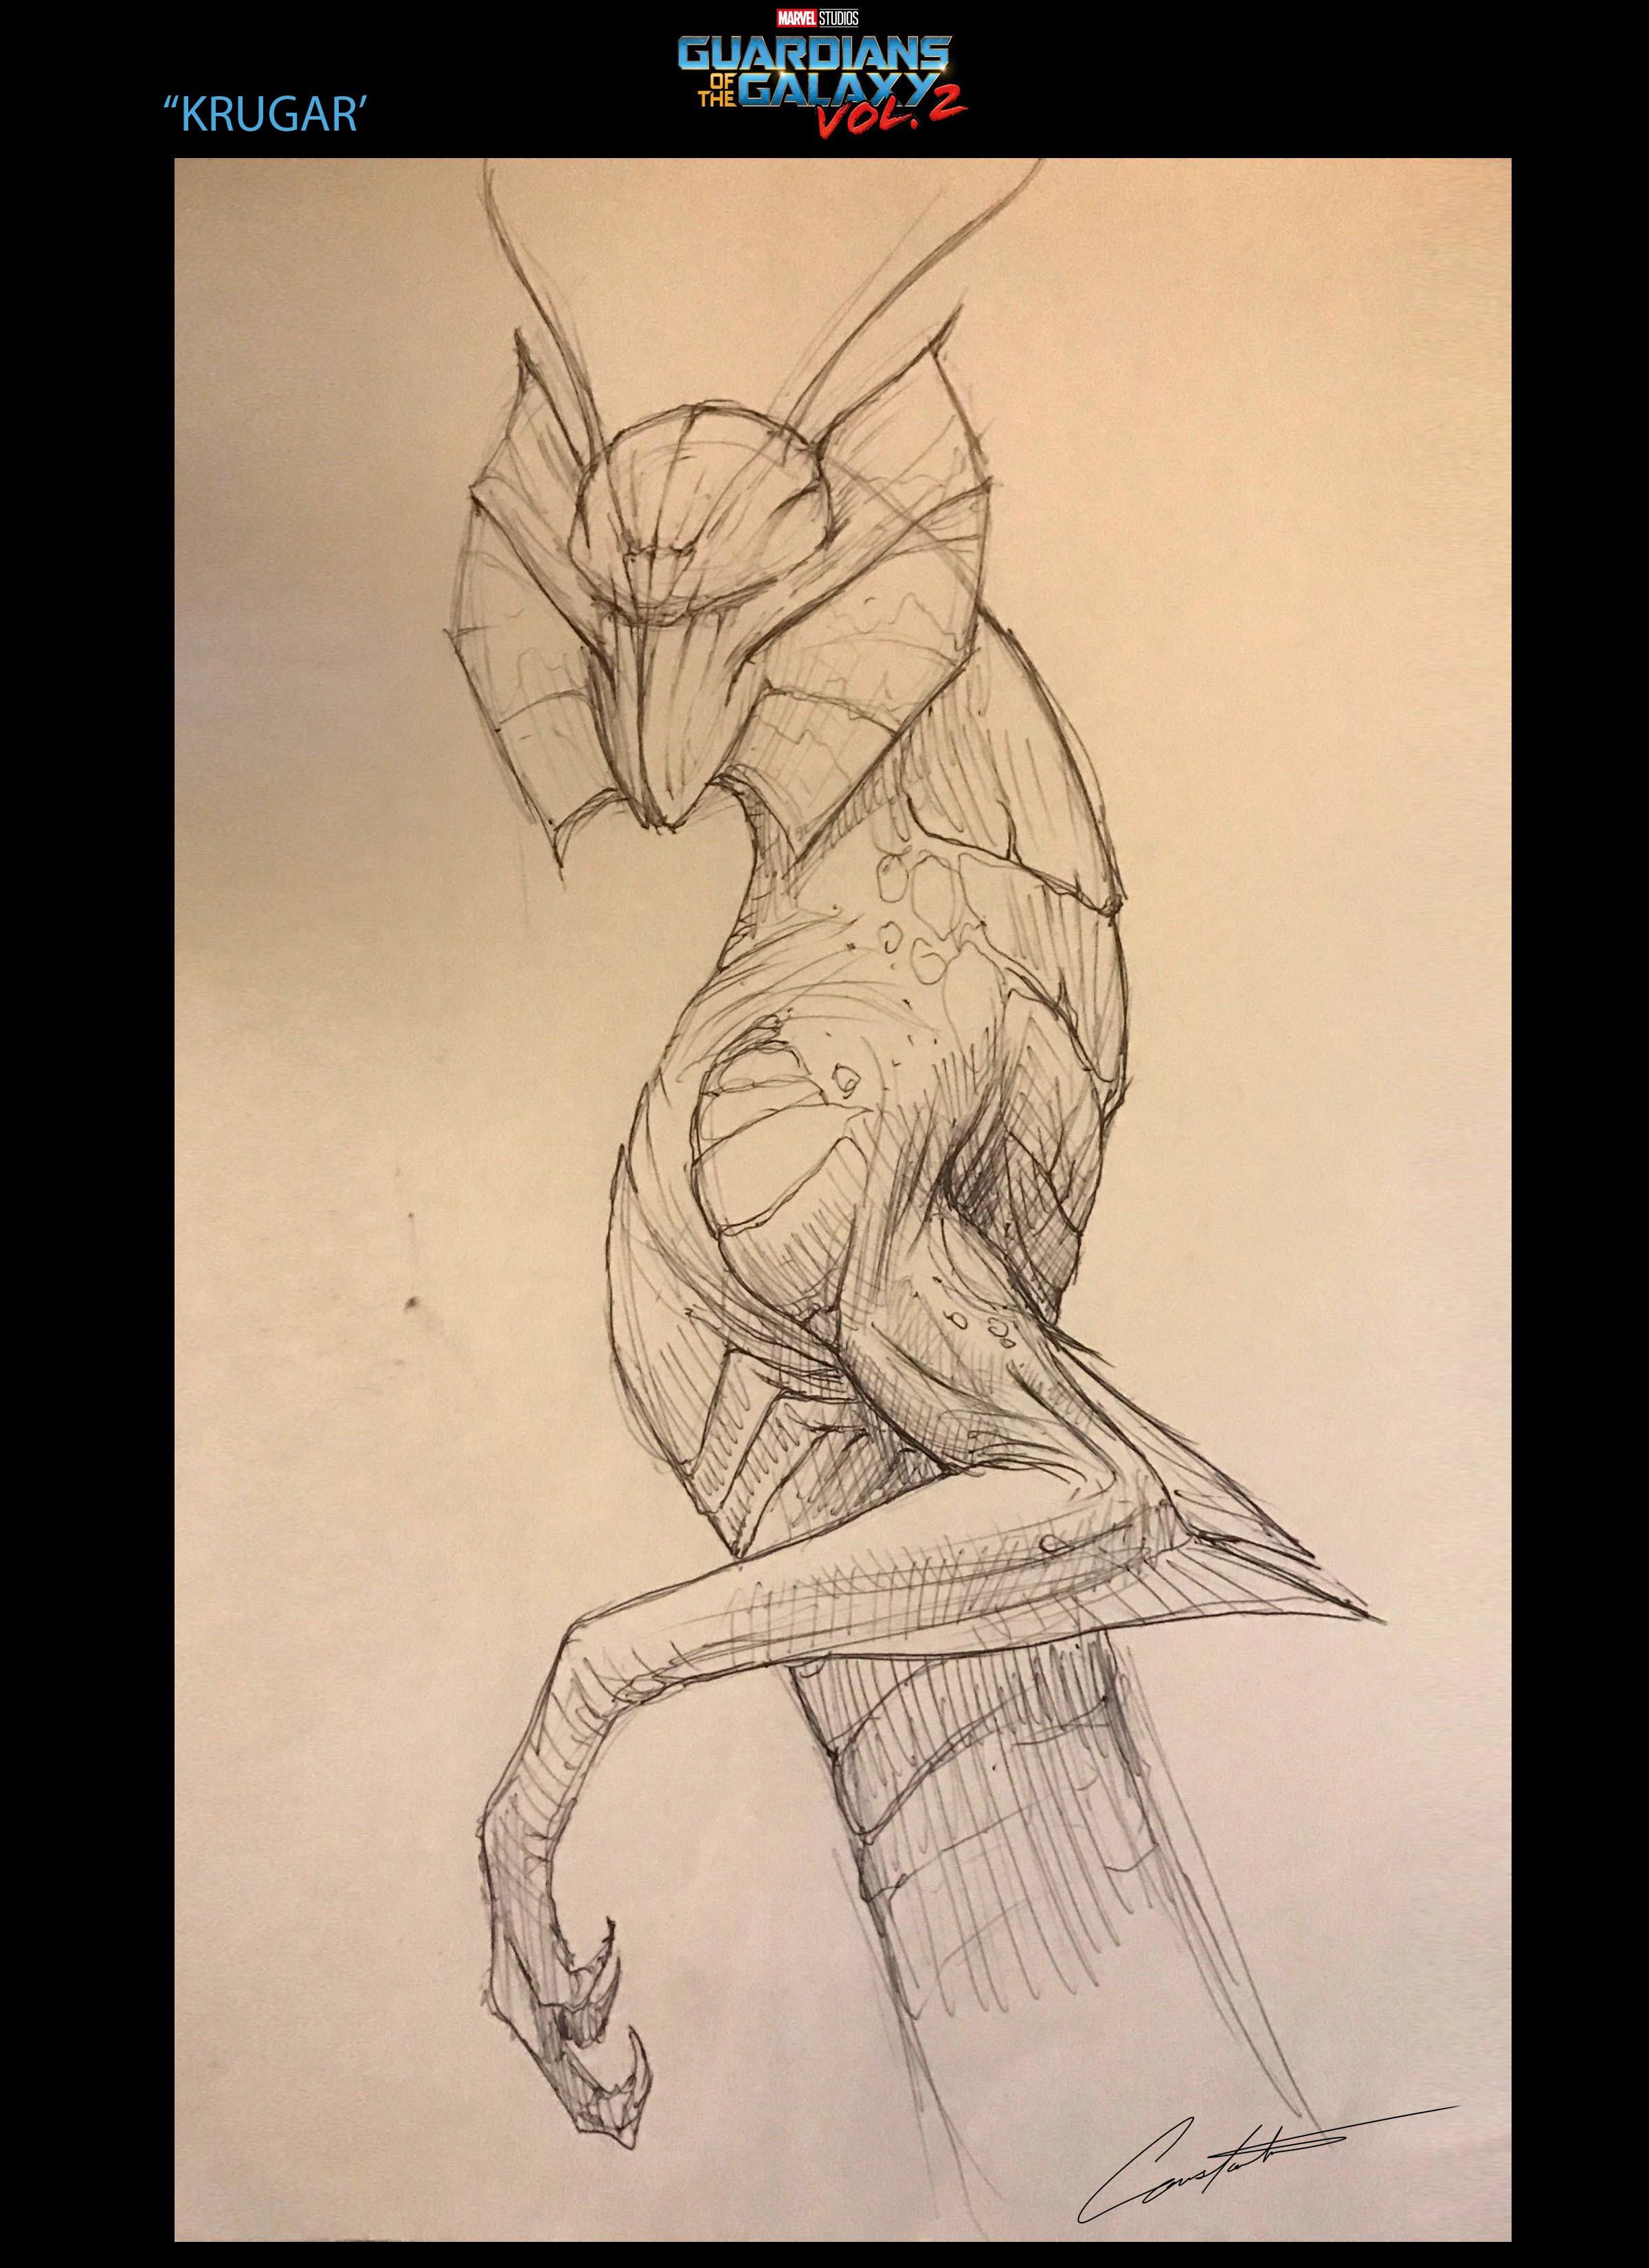 Guardians of the galaxy vol.2 Krugar rough sketch